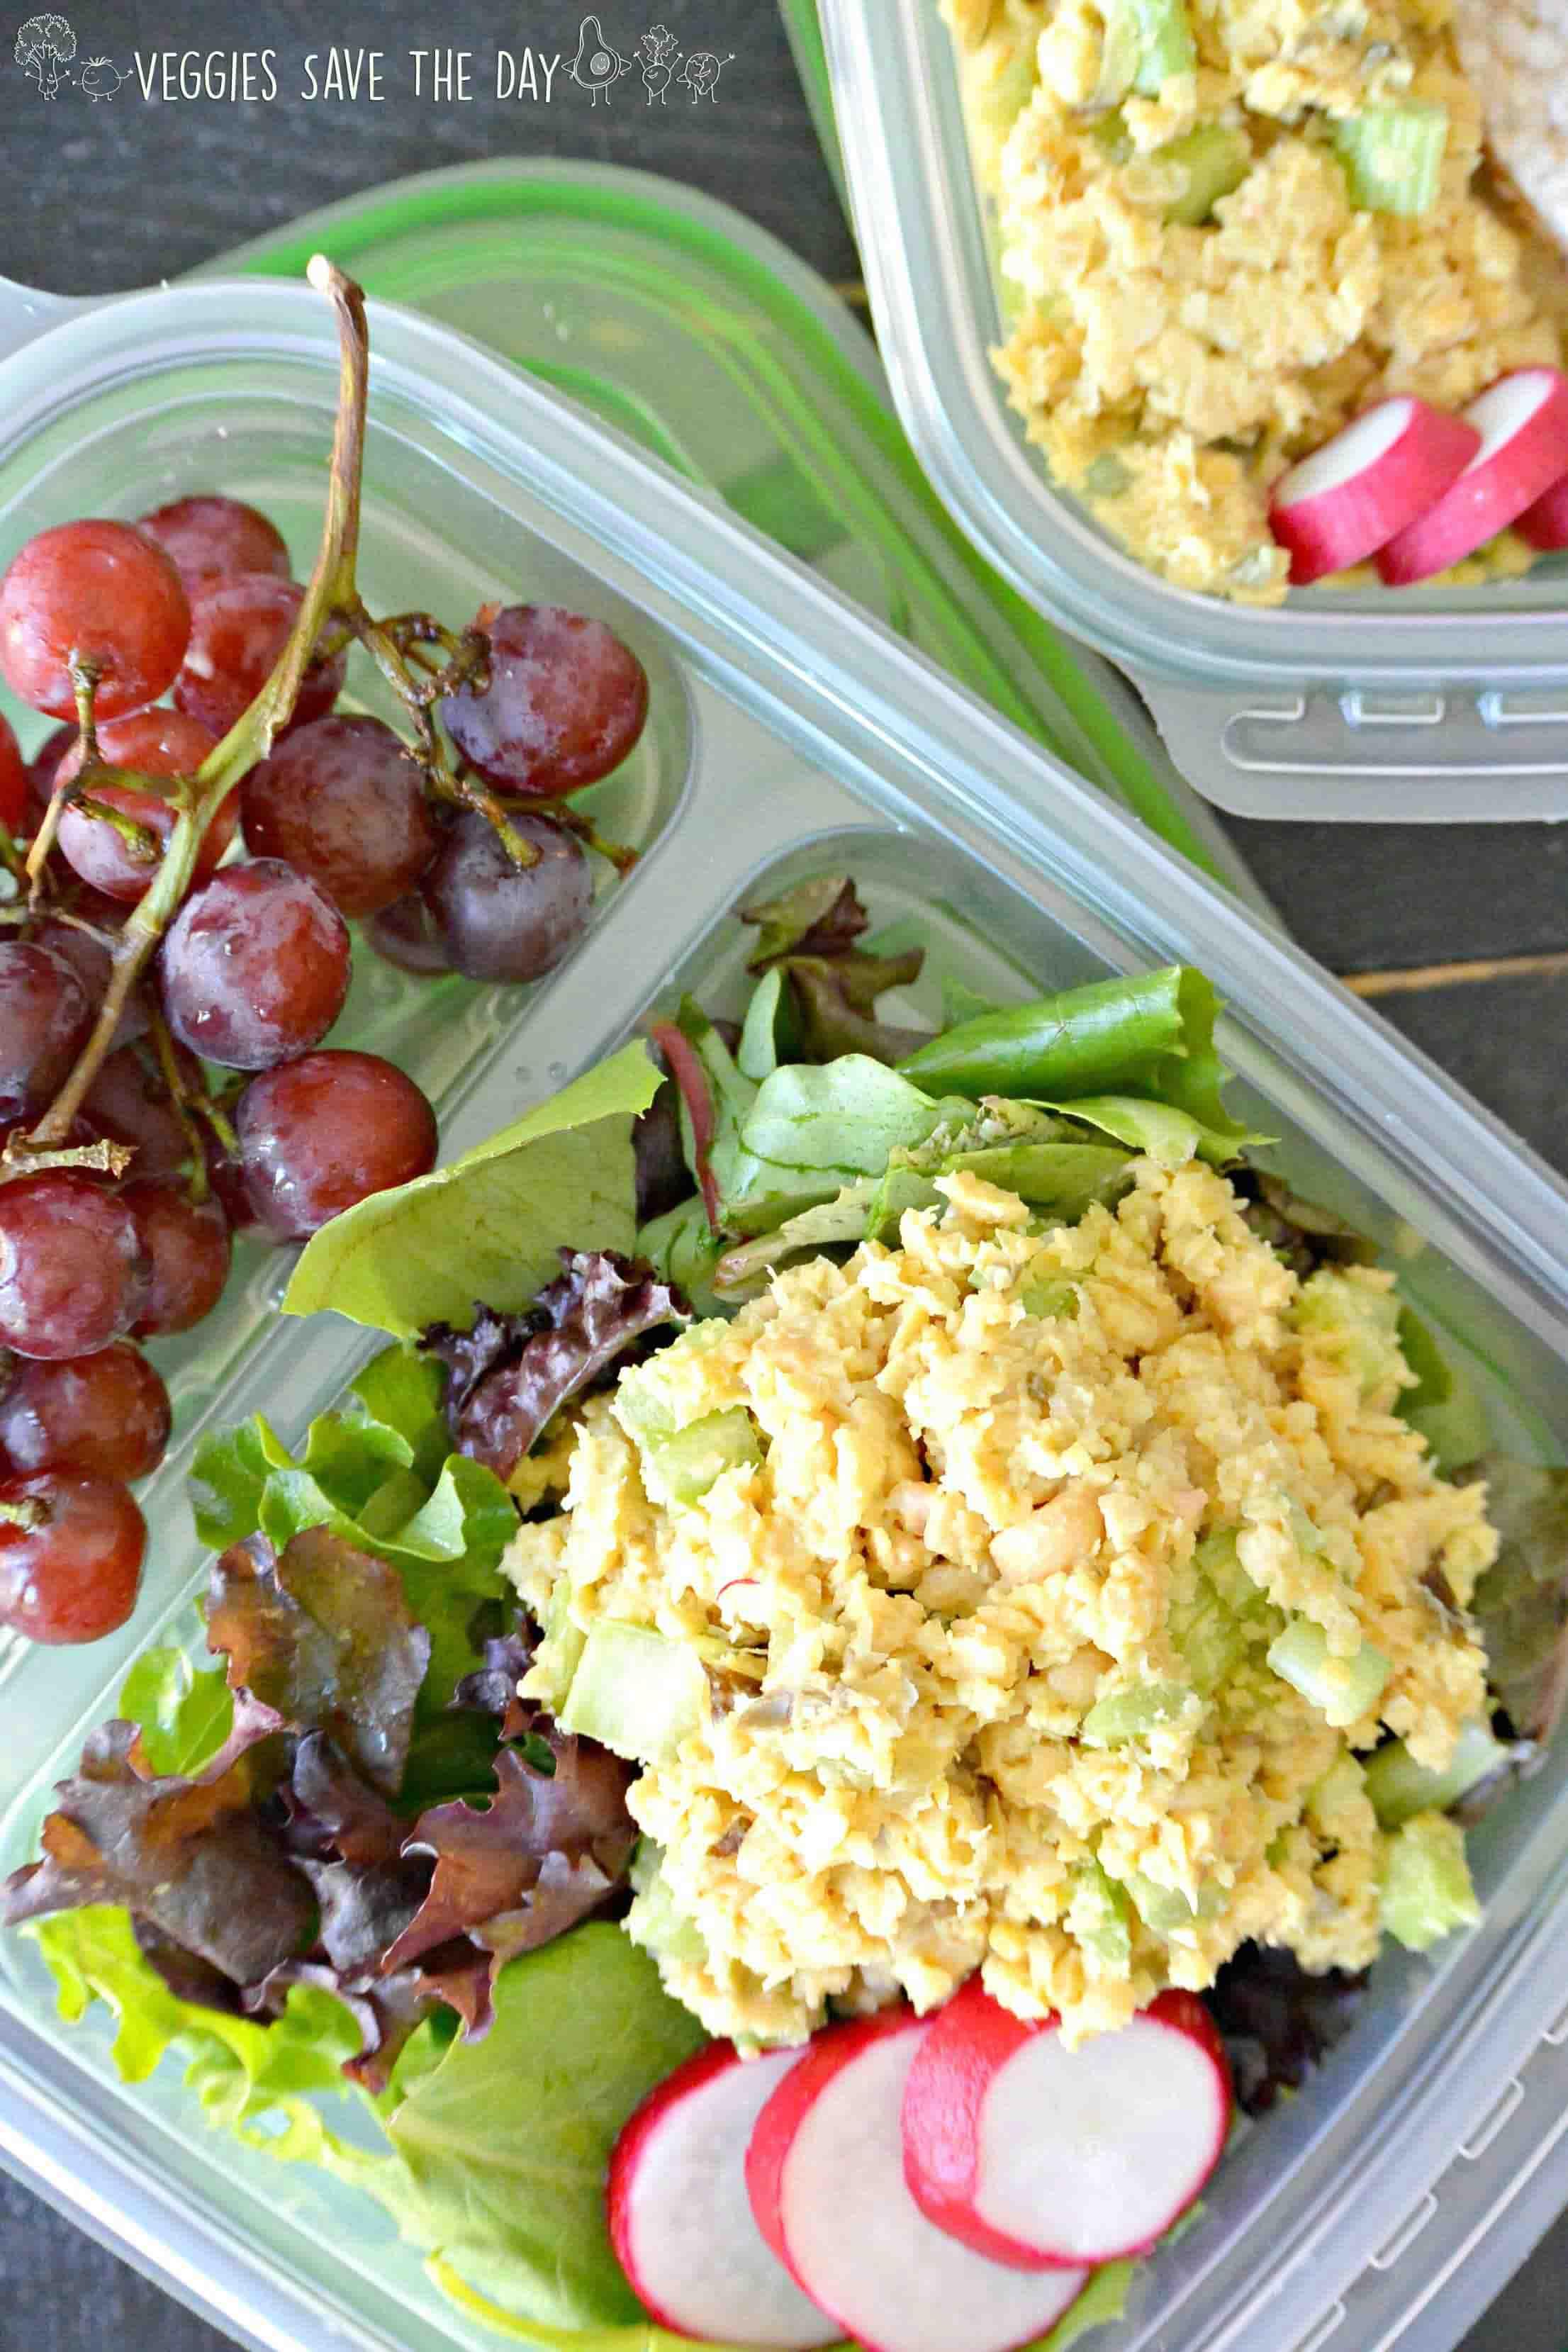 Vegan Tuna Salad, by Veggies Save the Day